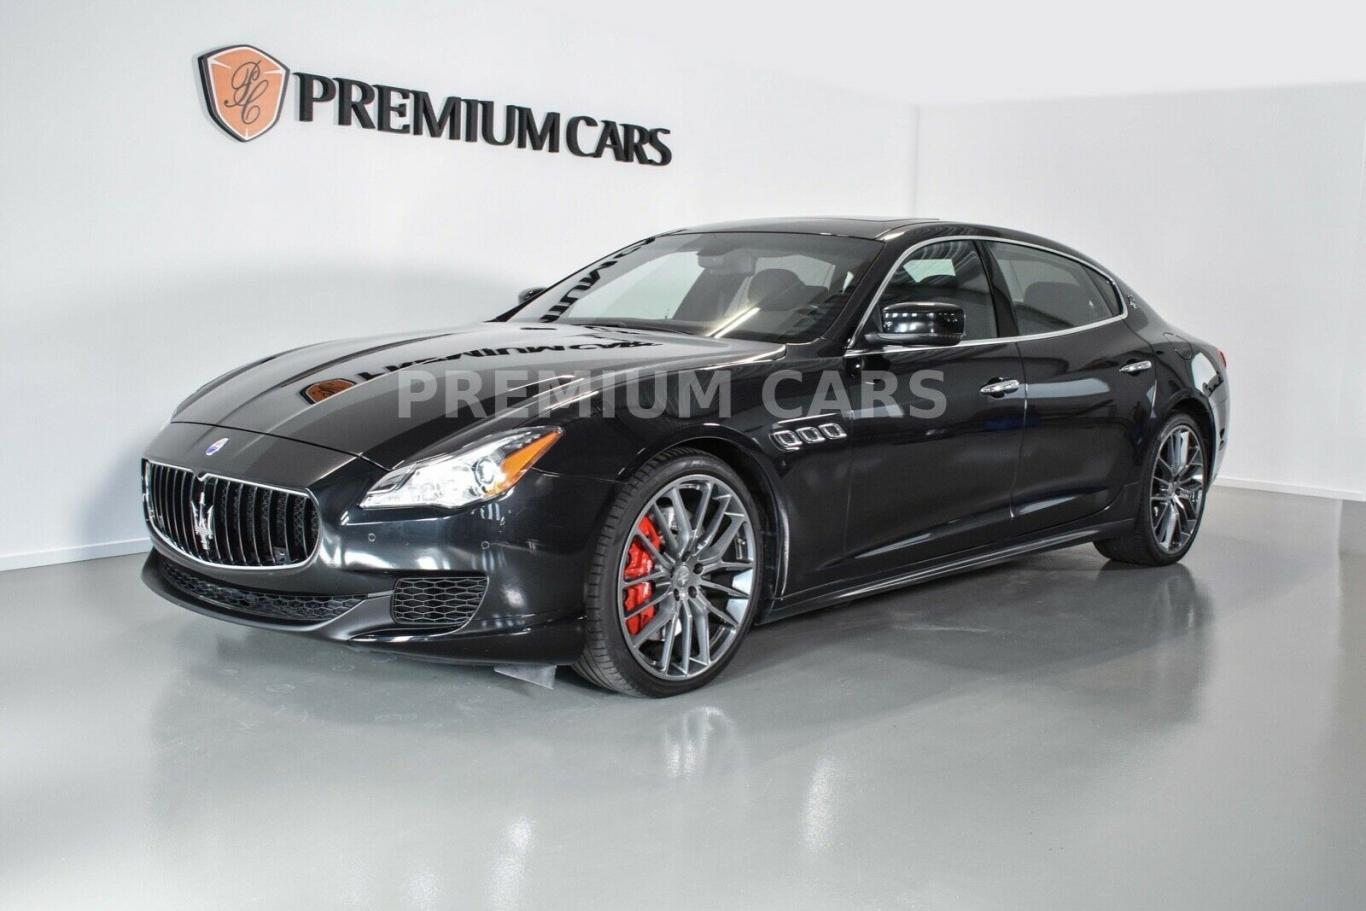 Maserati Quattroporte Gts >> Maserati Quattroporte Gts